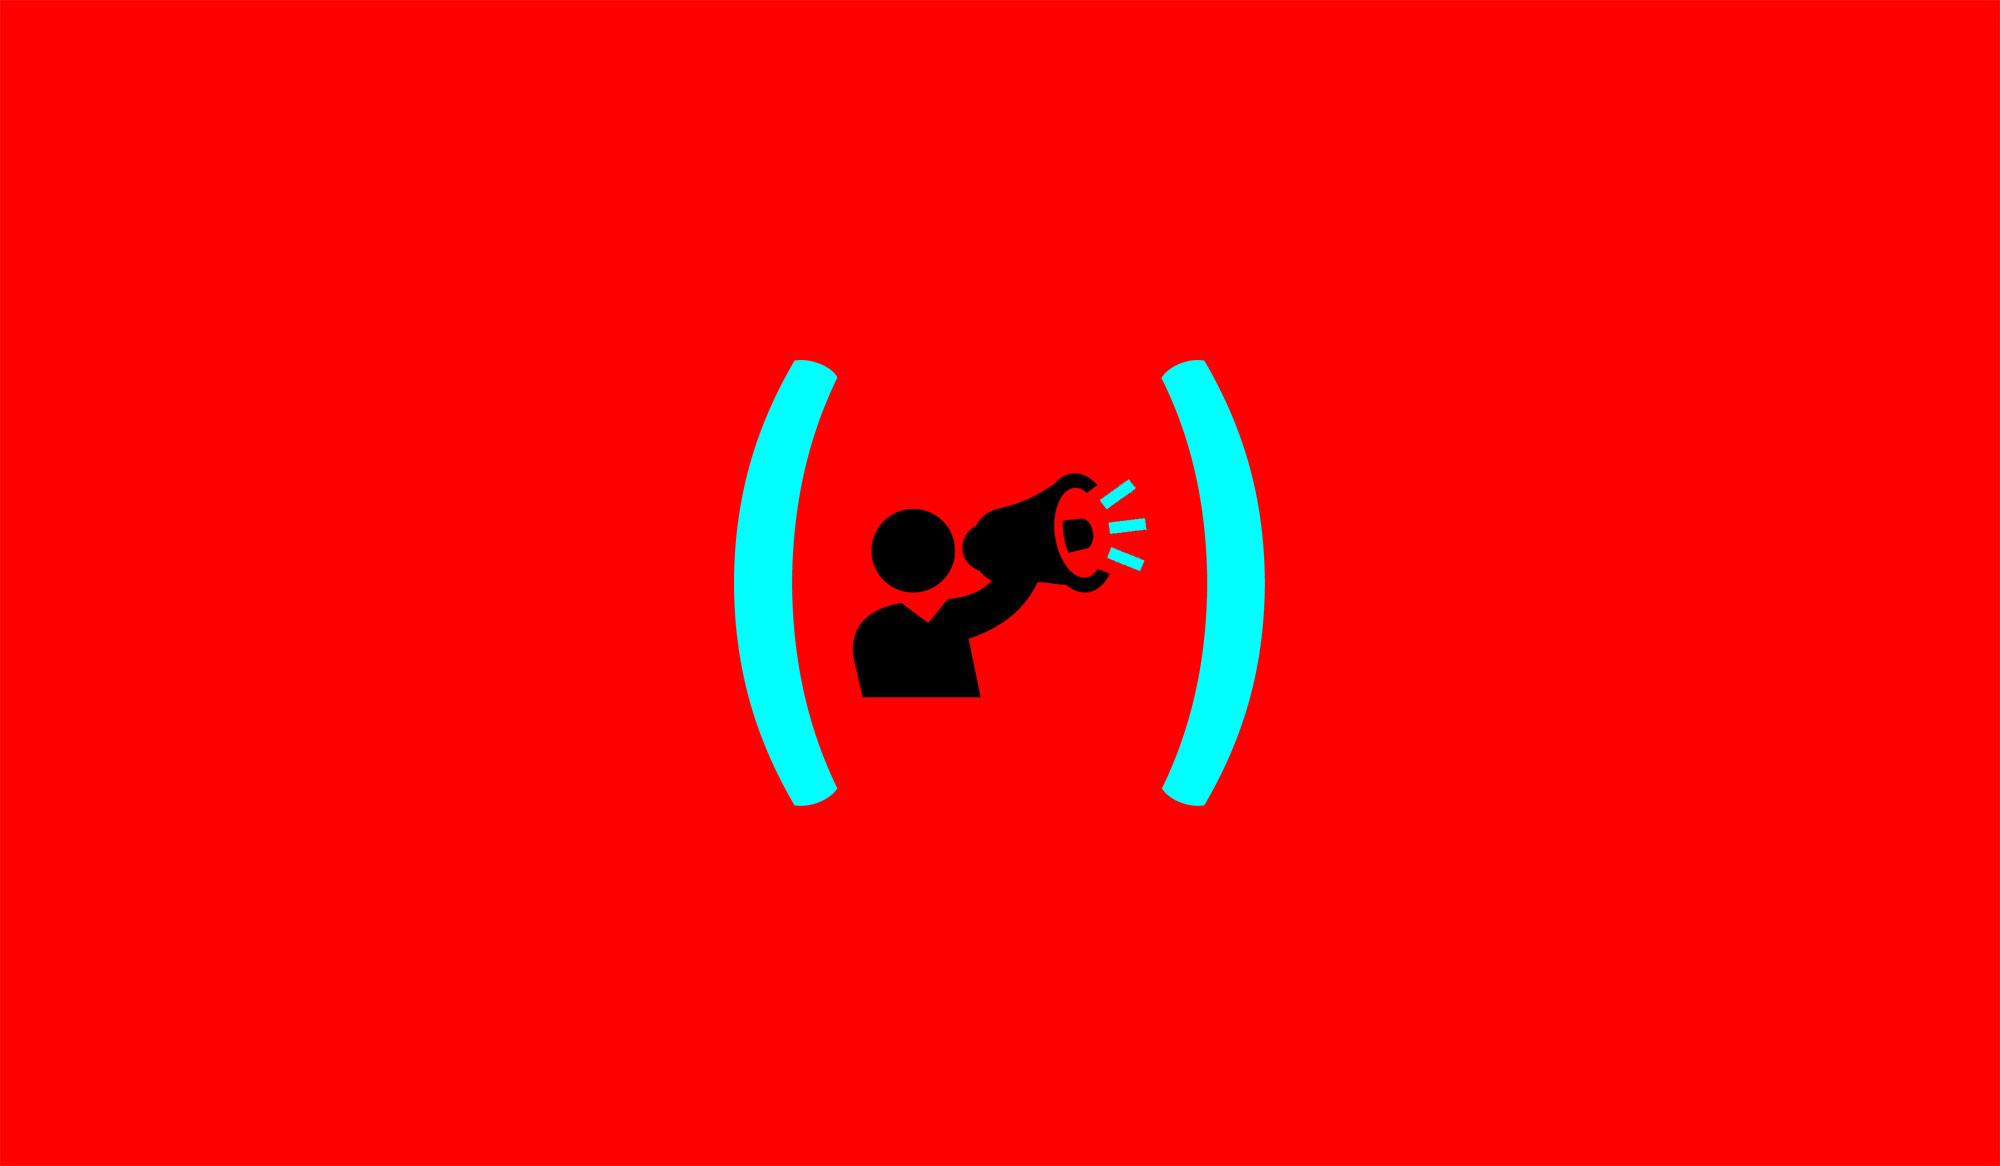 quentin_paquignon-branding-visual_identity-musi(x)™_04.png